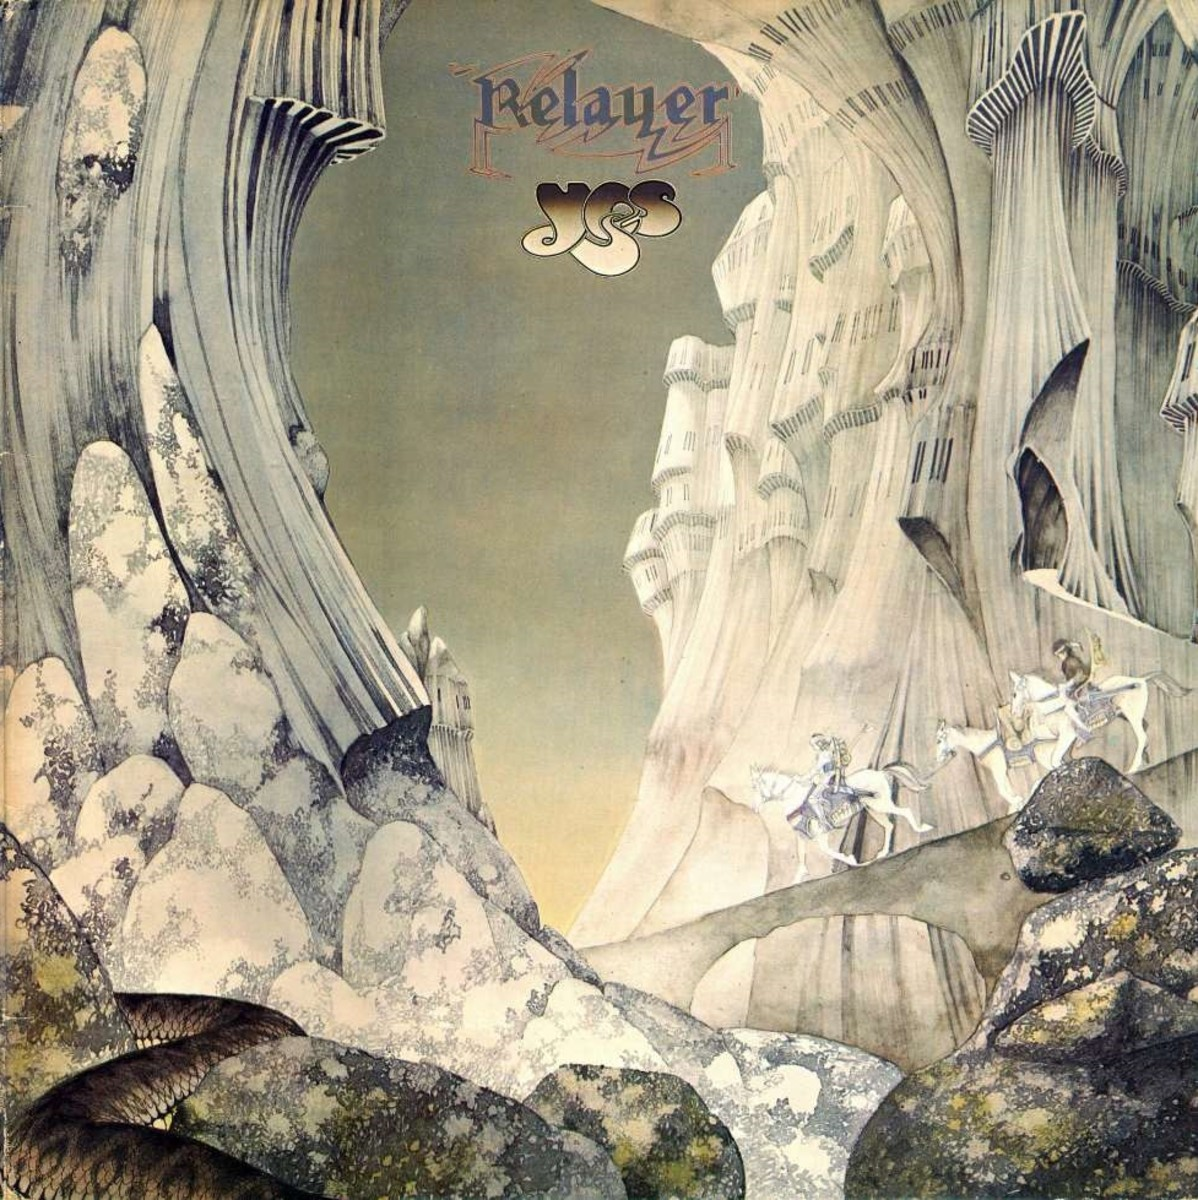 "Yes ""Relayer"" Atlantic Records SD 18122 12"" LP Vinyl Record, US Pressing (1974) Gatefold Album Cover Art & Design by Roger Dean"